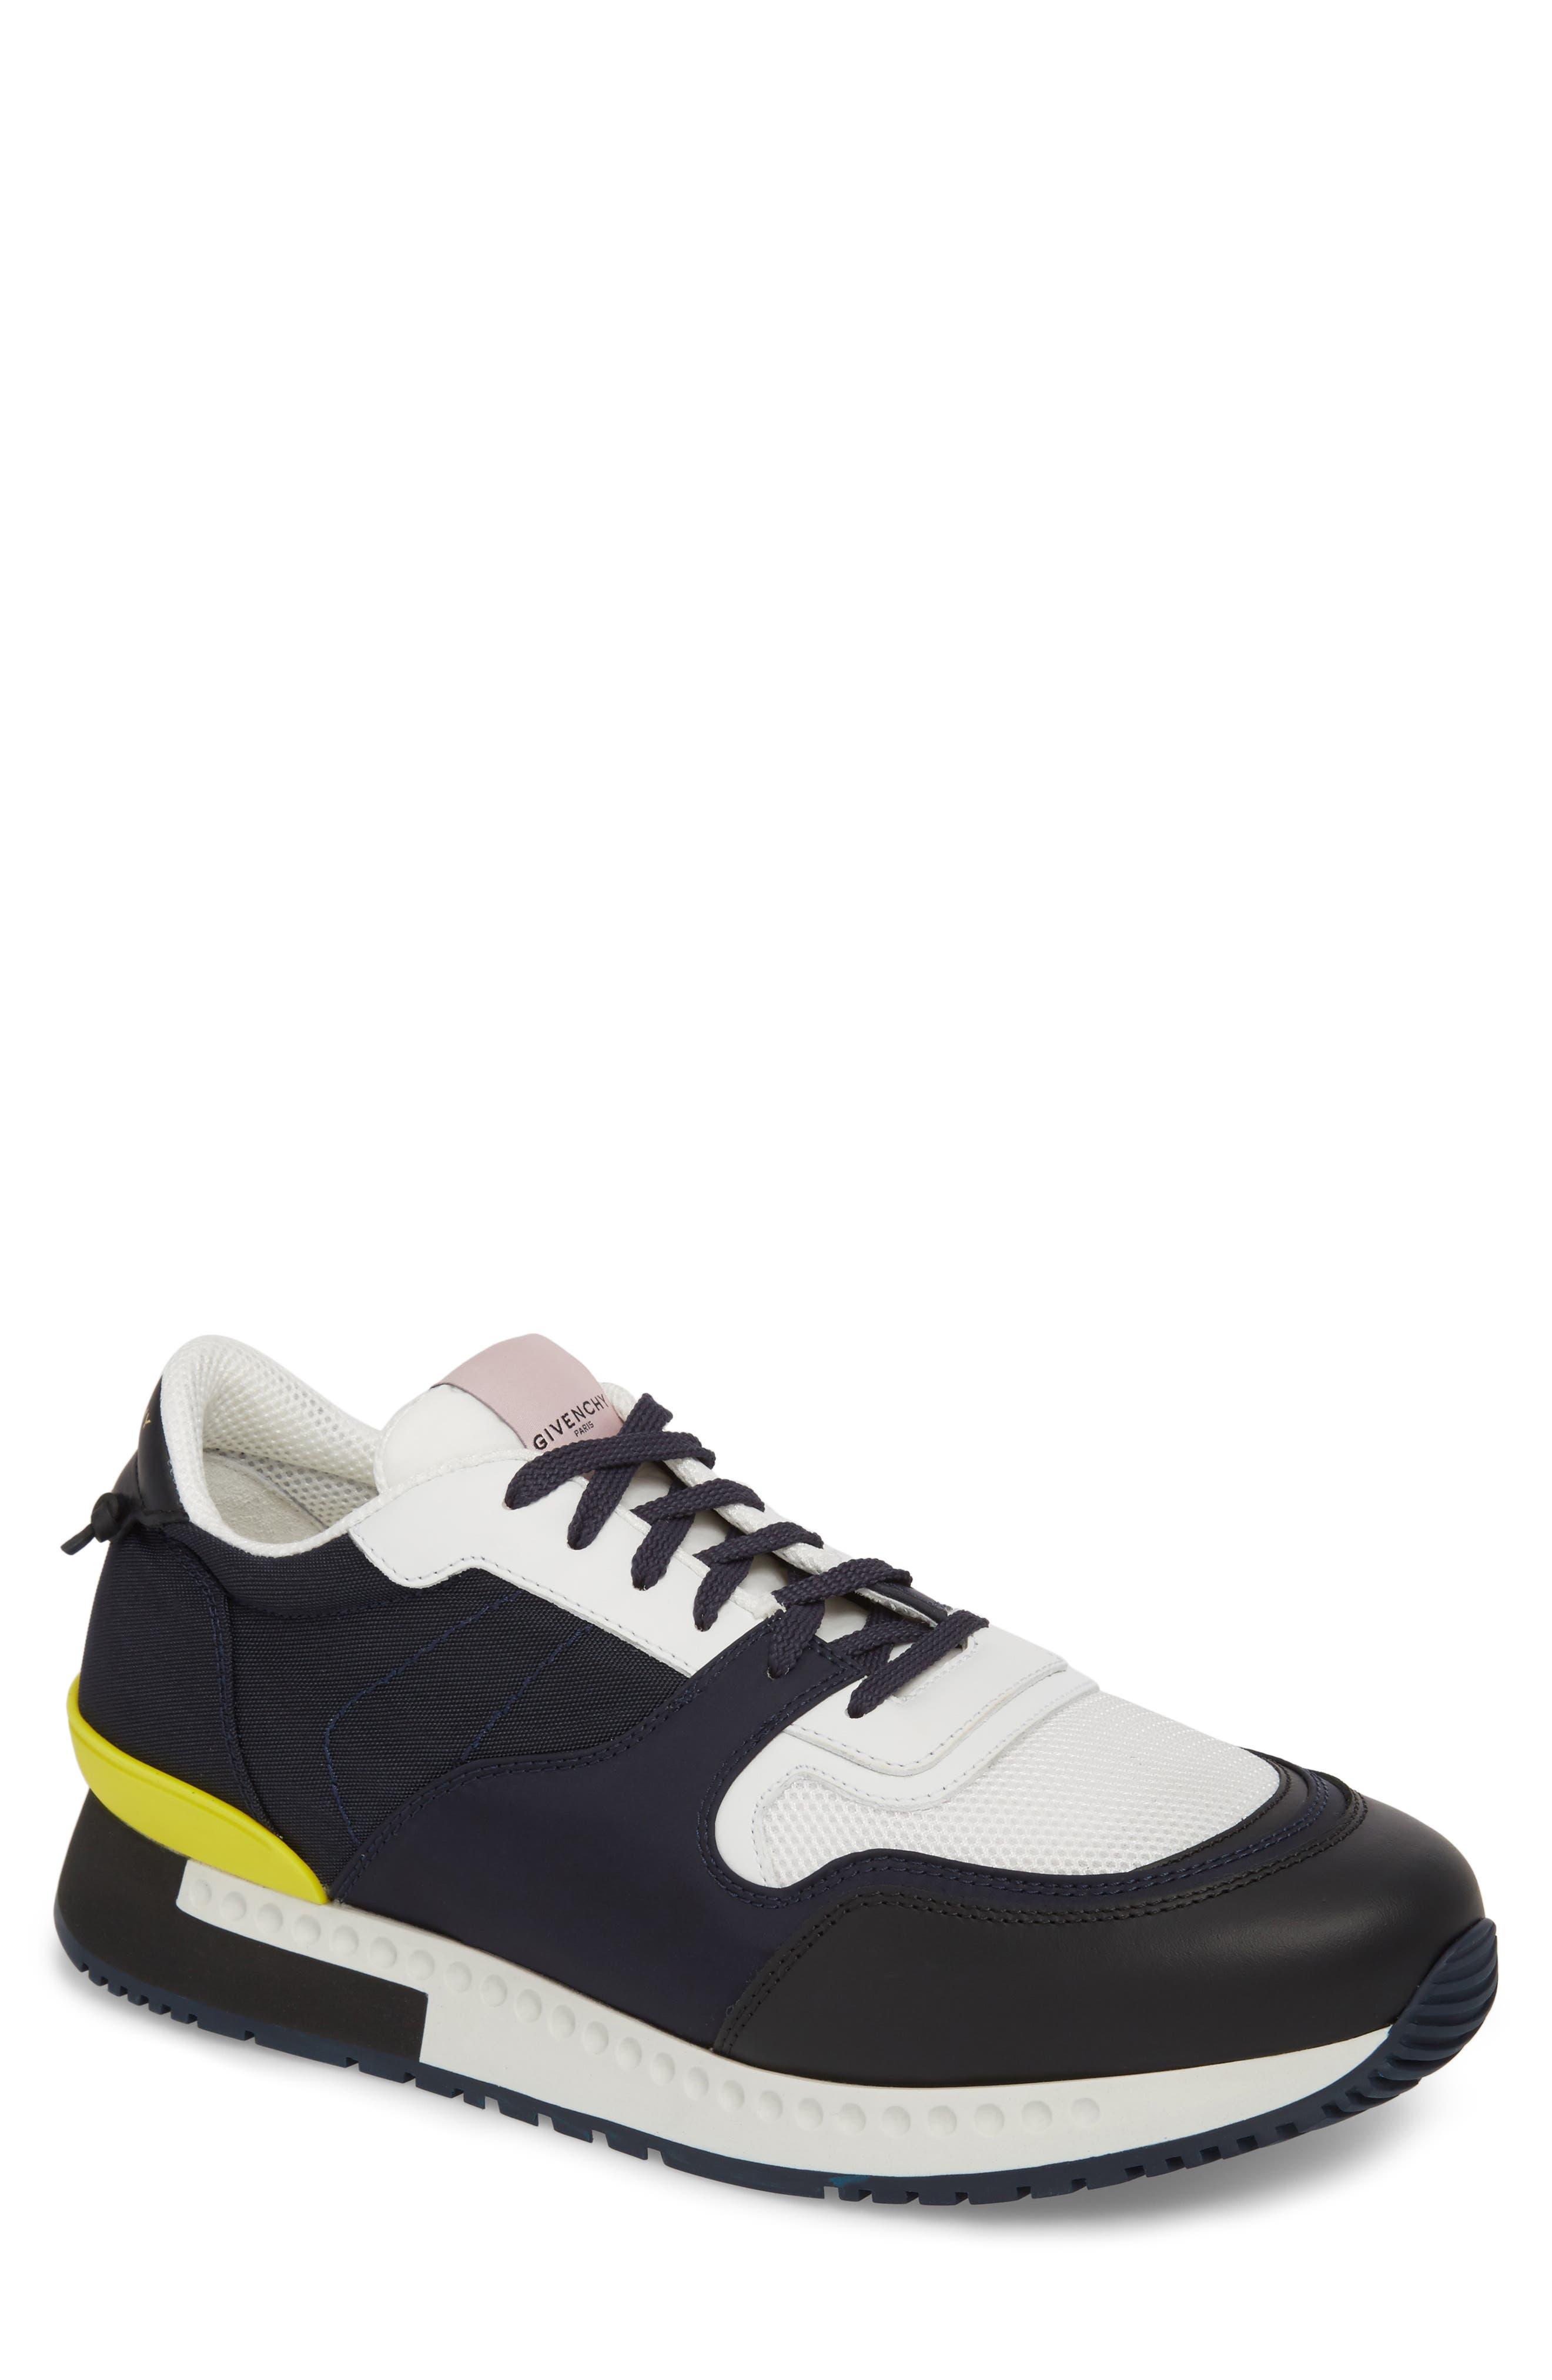 Alternate Image 1 Selected - Givenchy 'Active Runner' Sneaker (Men)